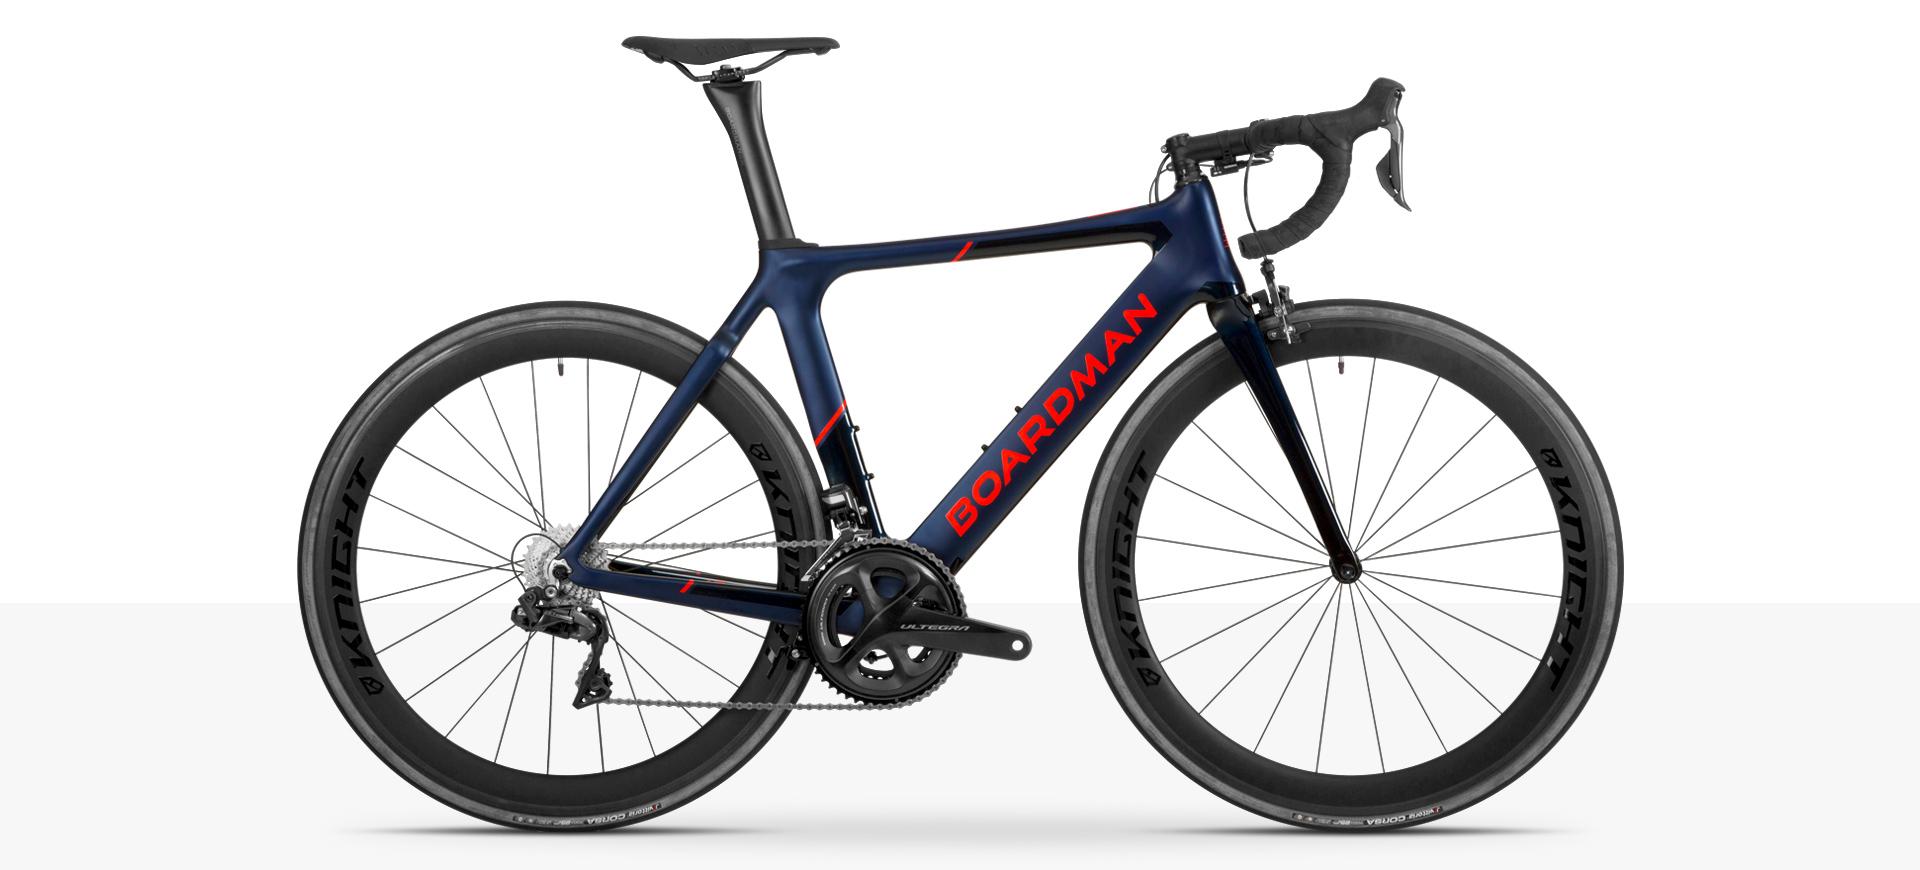 AIR 9 6 - Men's Aero Bike | Boardman Bikes